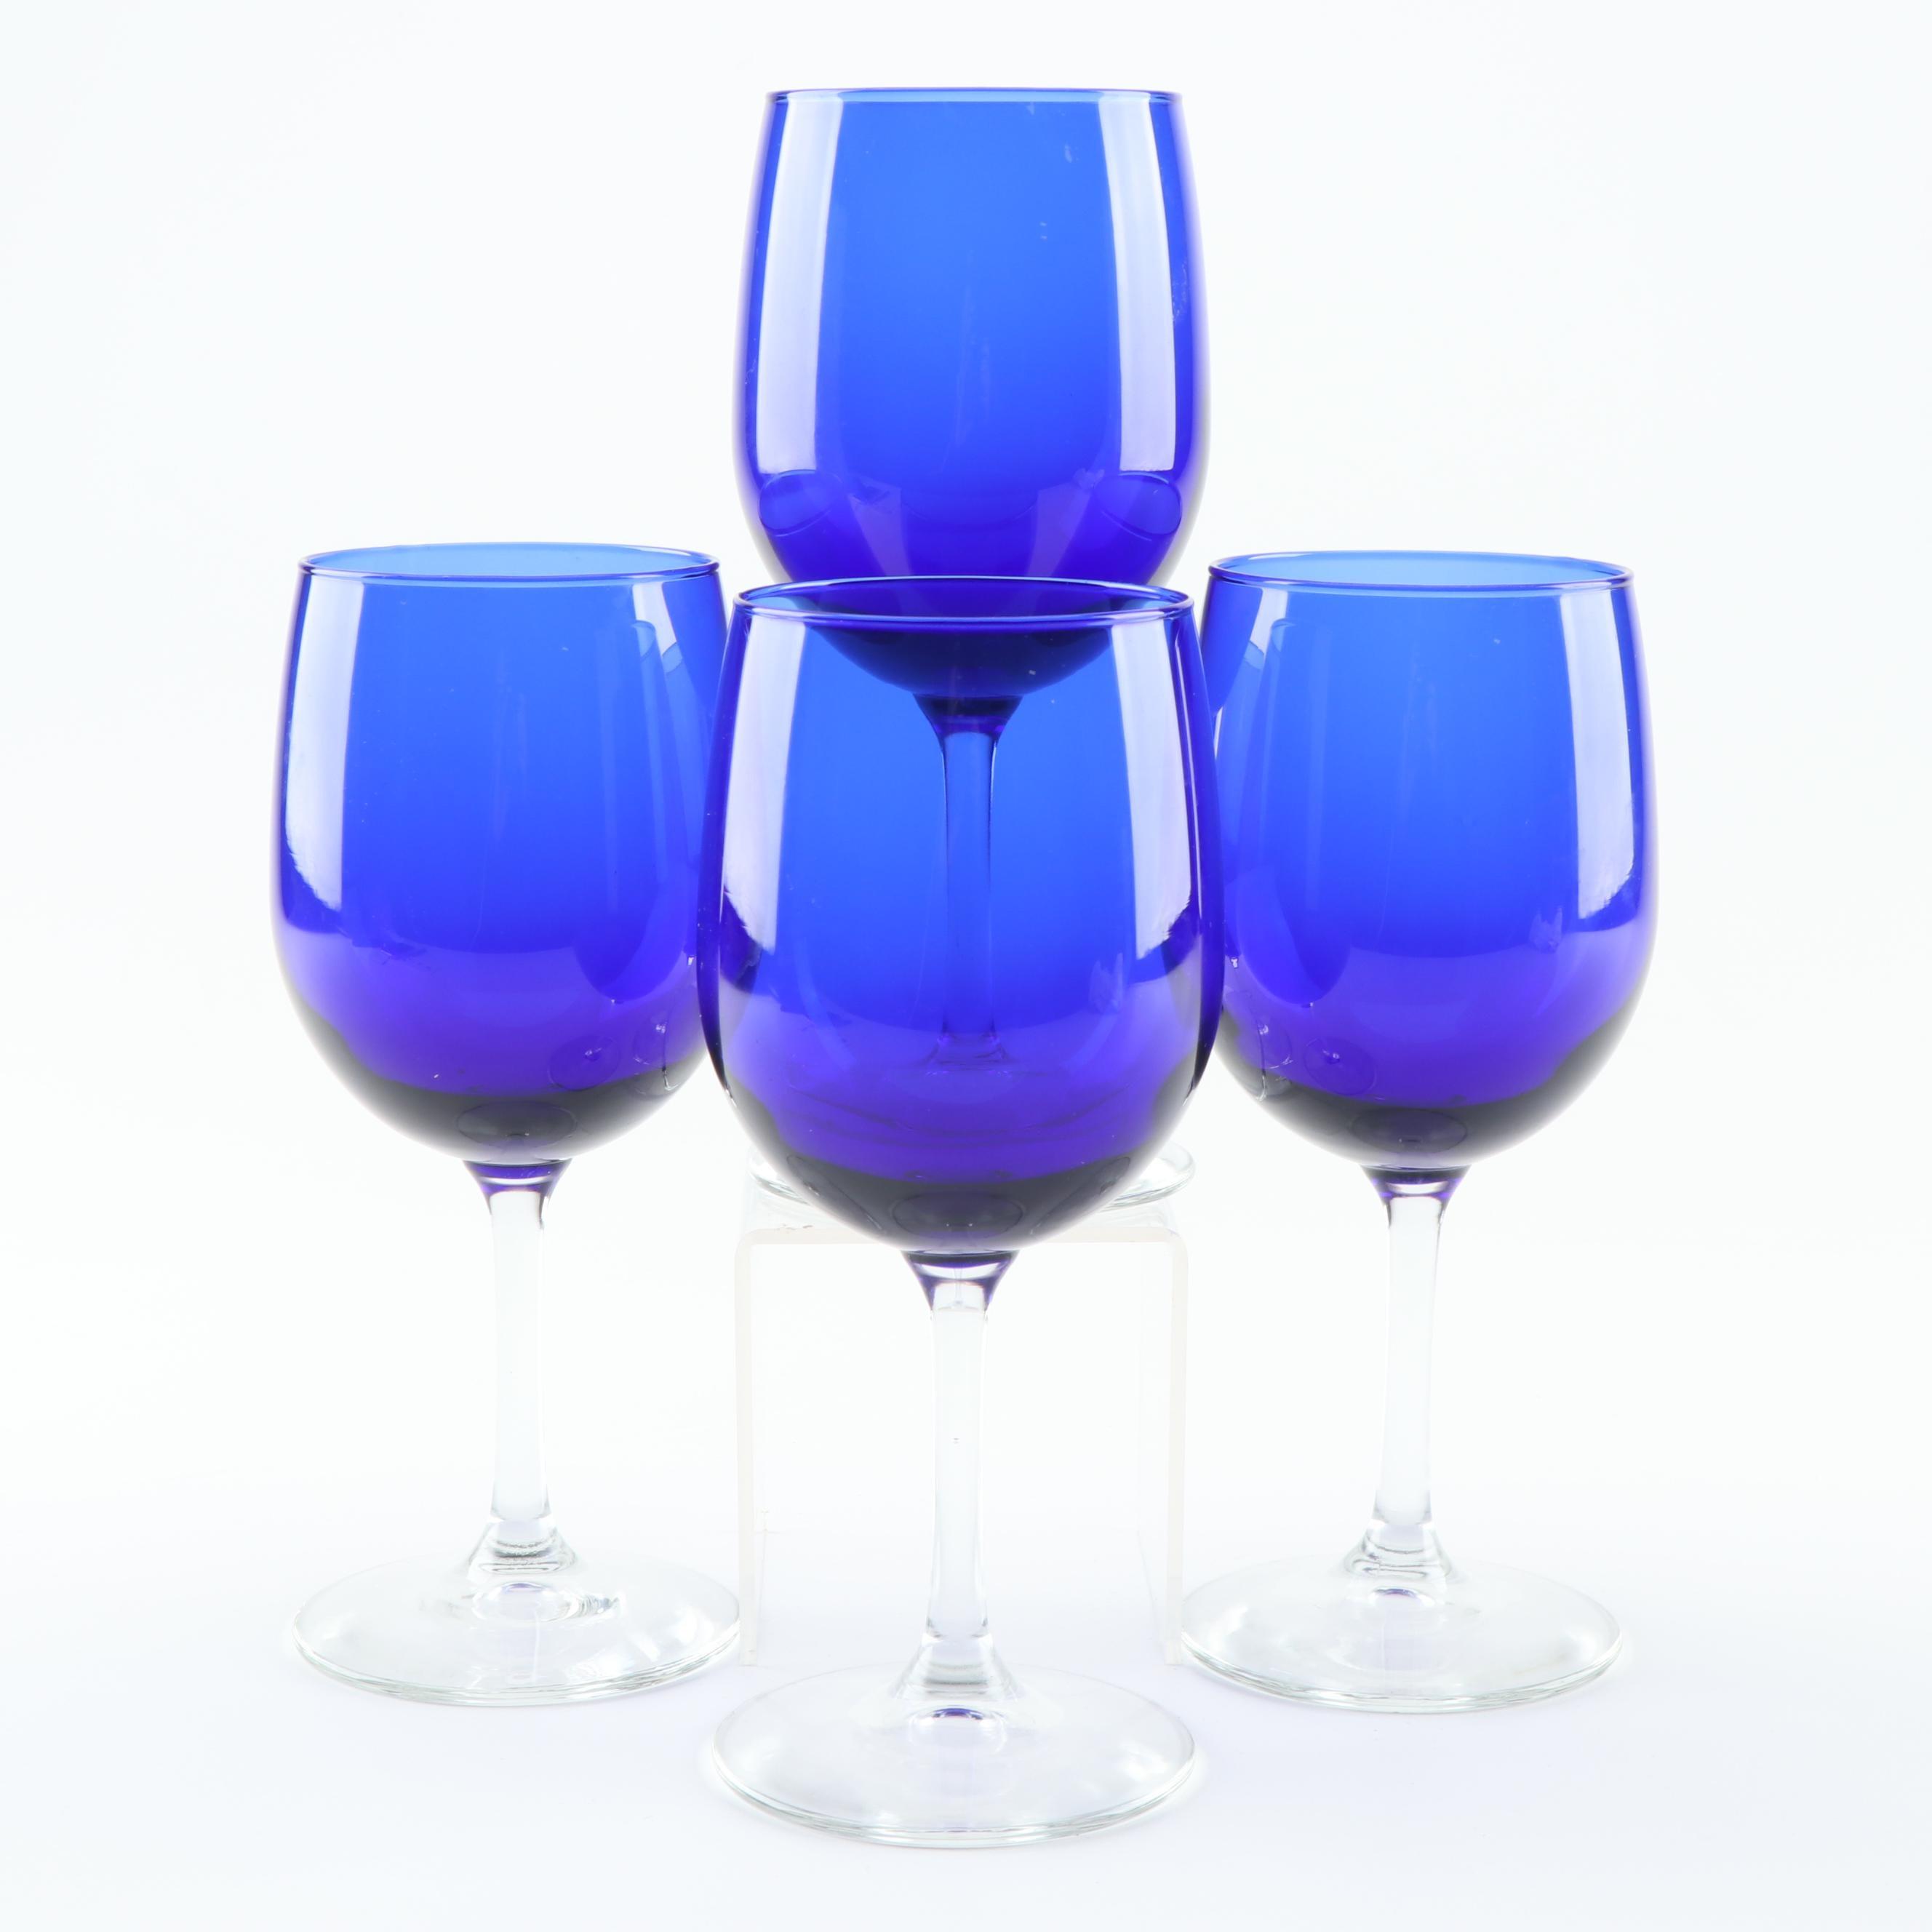 Cobalt Tint White Wine Glasses